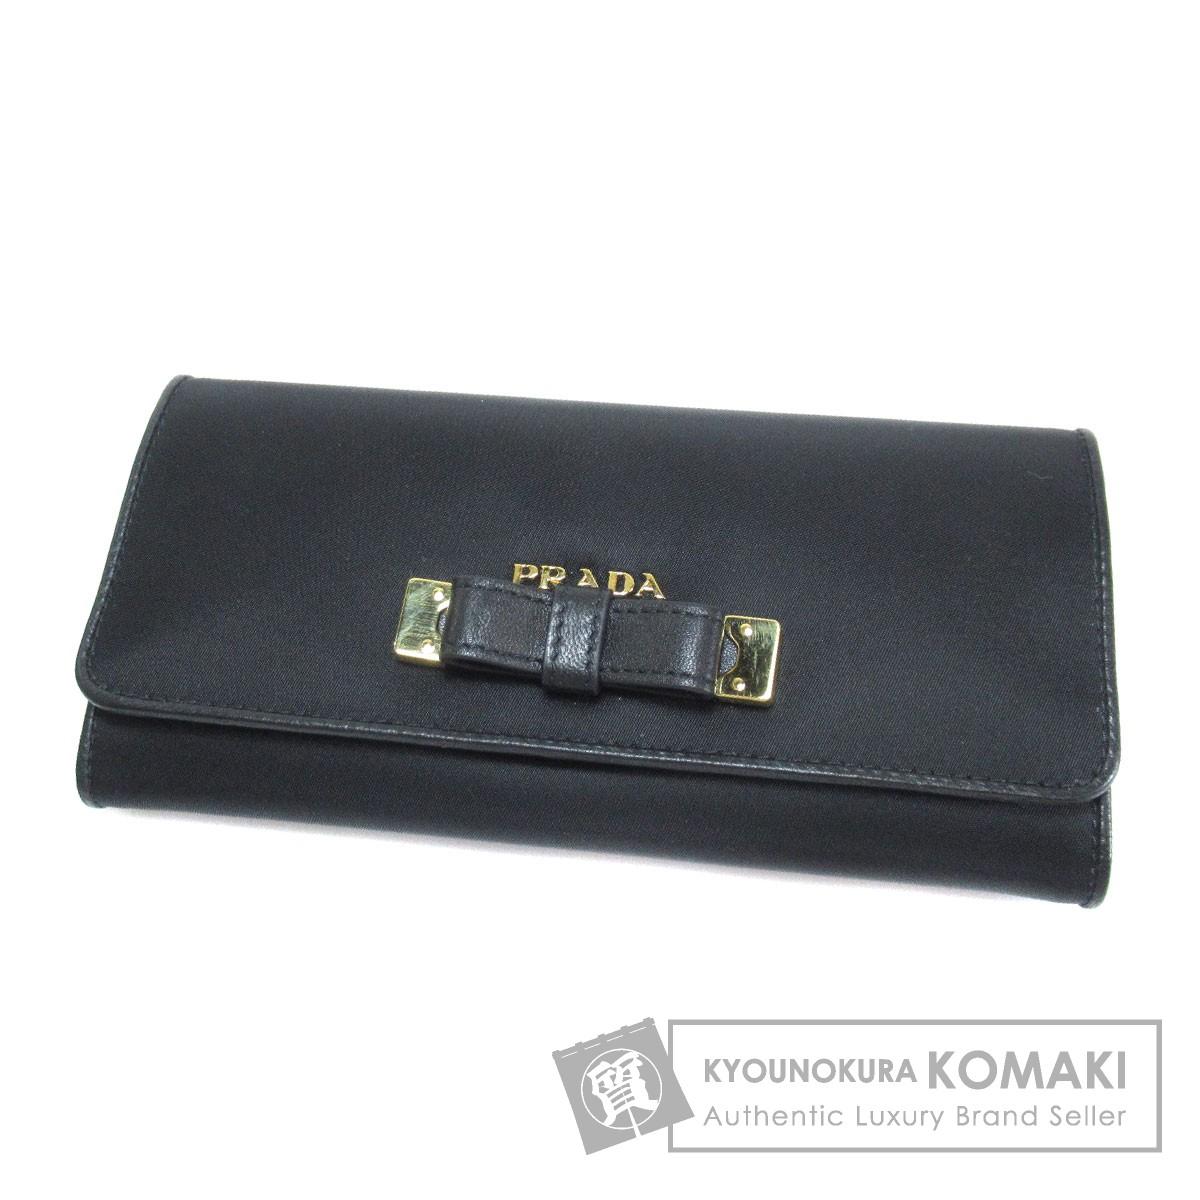 PRADA ロゴモチーフ 長財布(小銭入れあり) ナイロン素材 レディース 【中古】【プラダ】